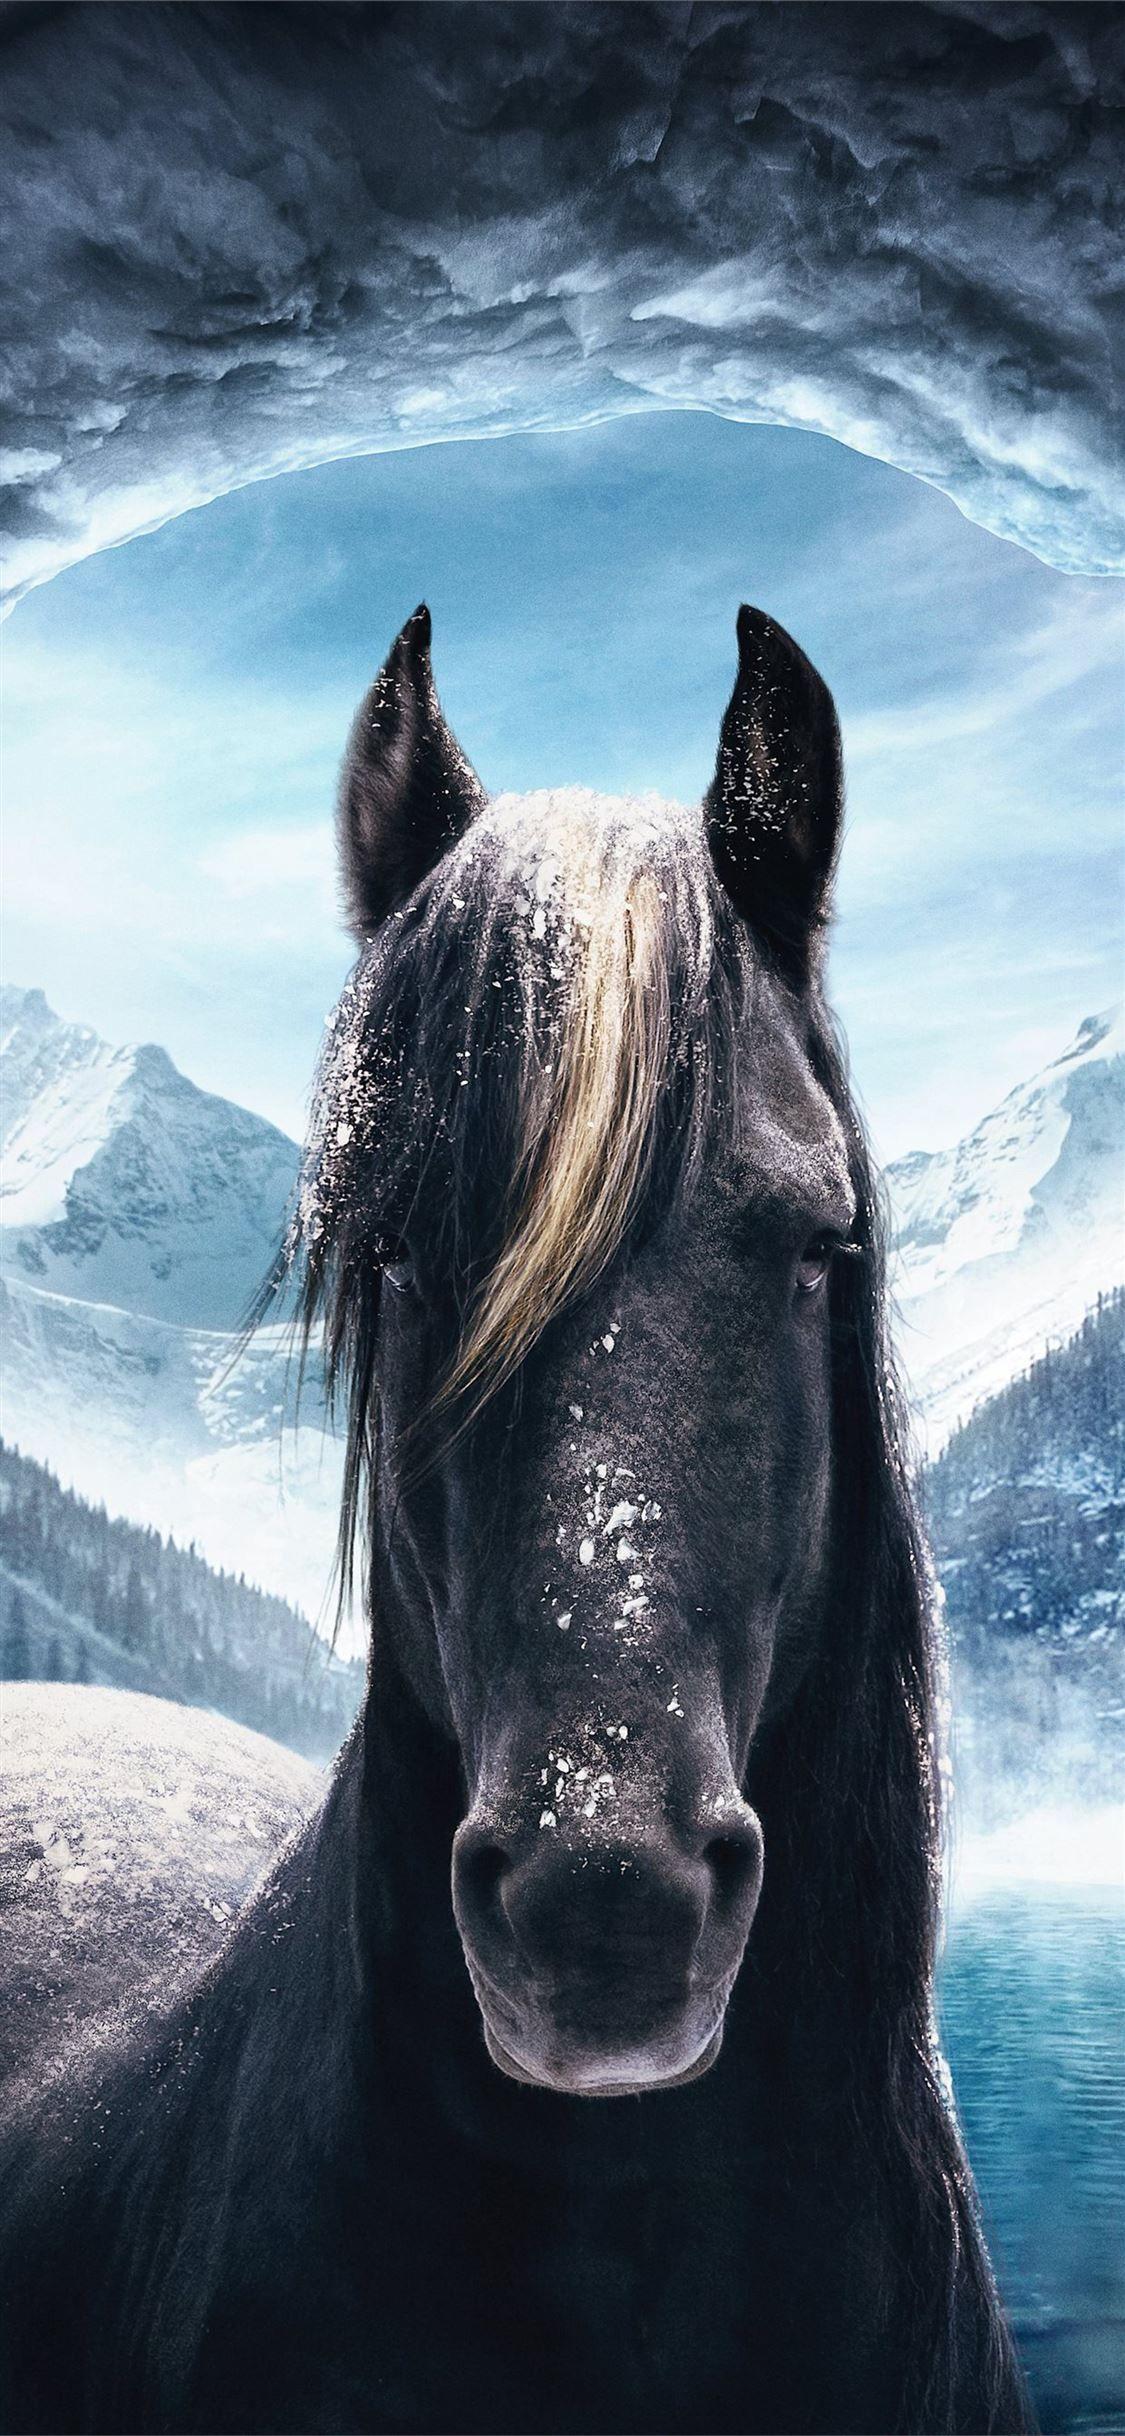 Bethany Jumanji The Next Level Jumanjithenextlevel Movies 2019movies 4k Jumanji3 Iphone11wallpaper Horse Wallpaper Cute Horses Wallpaper